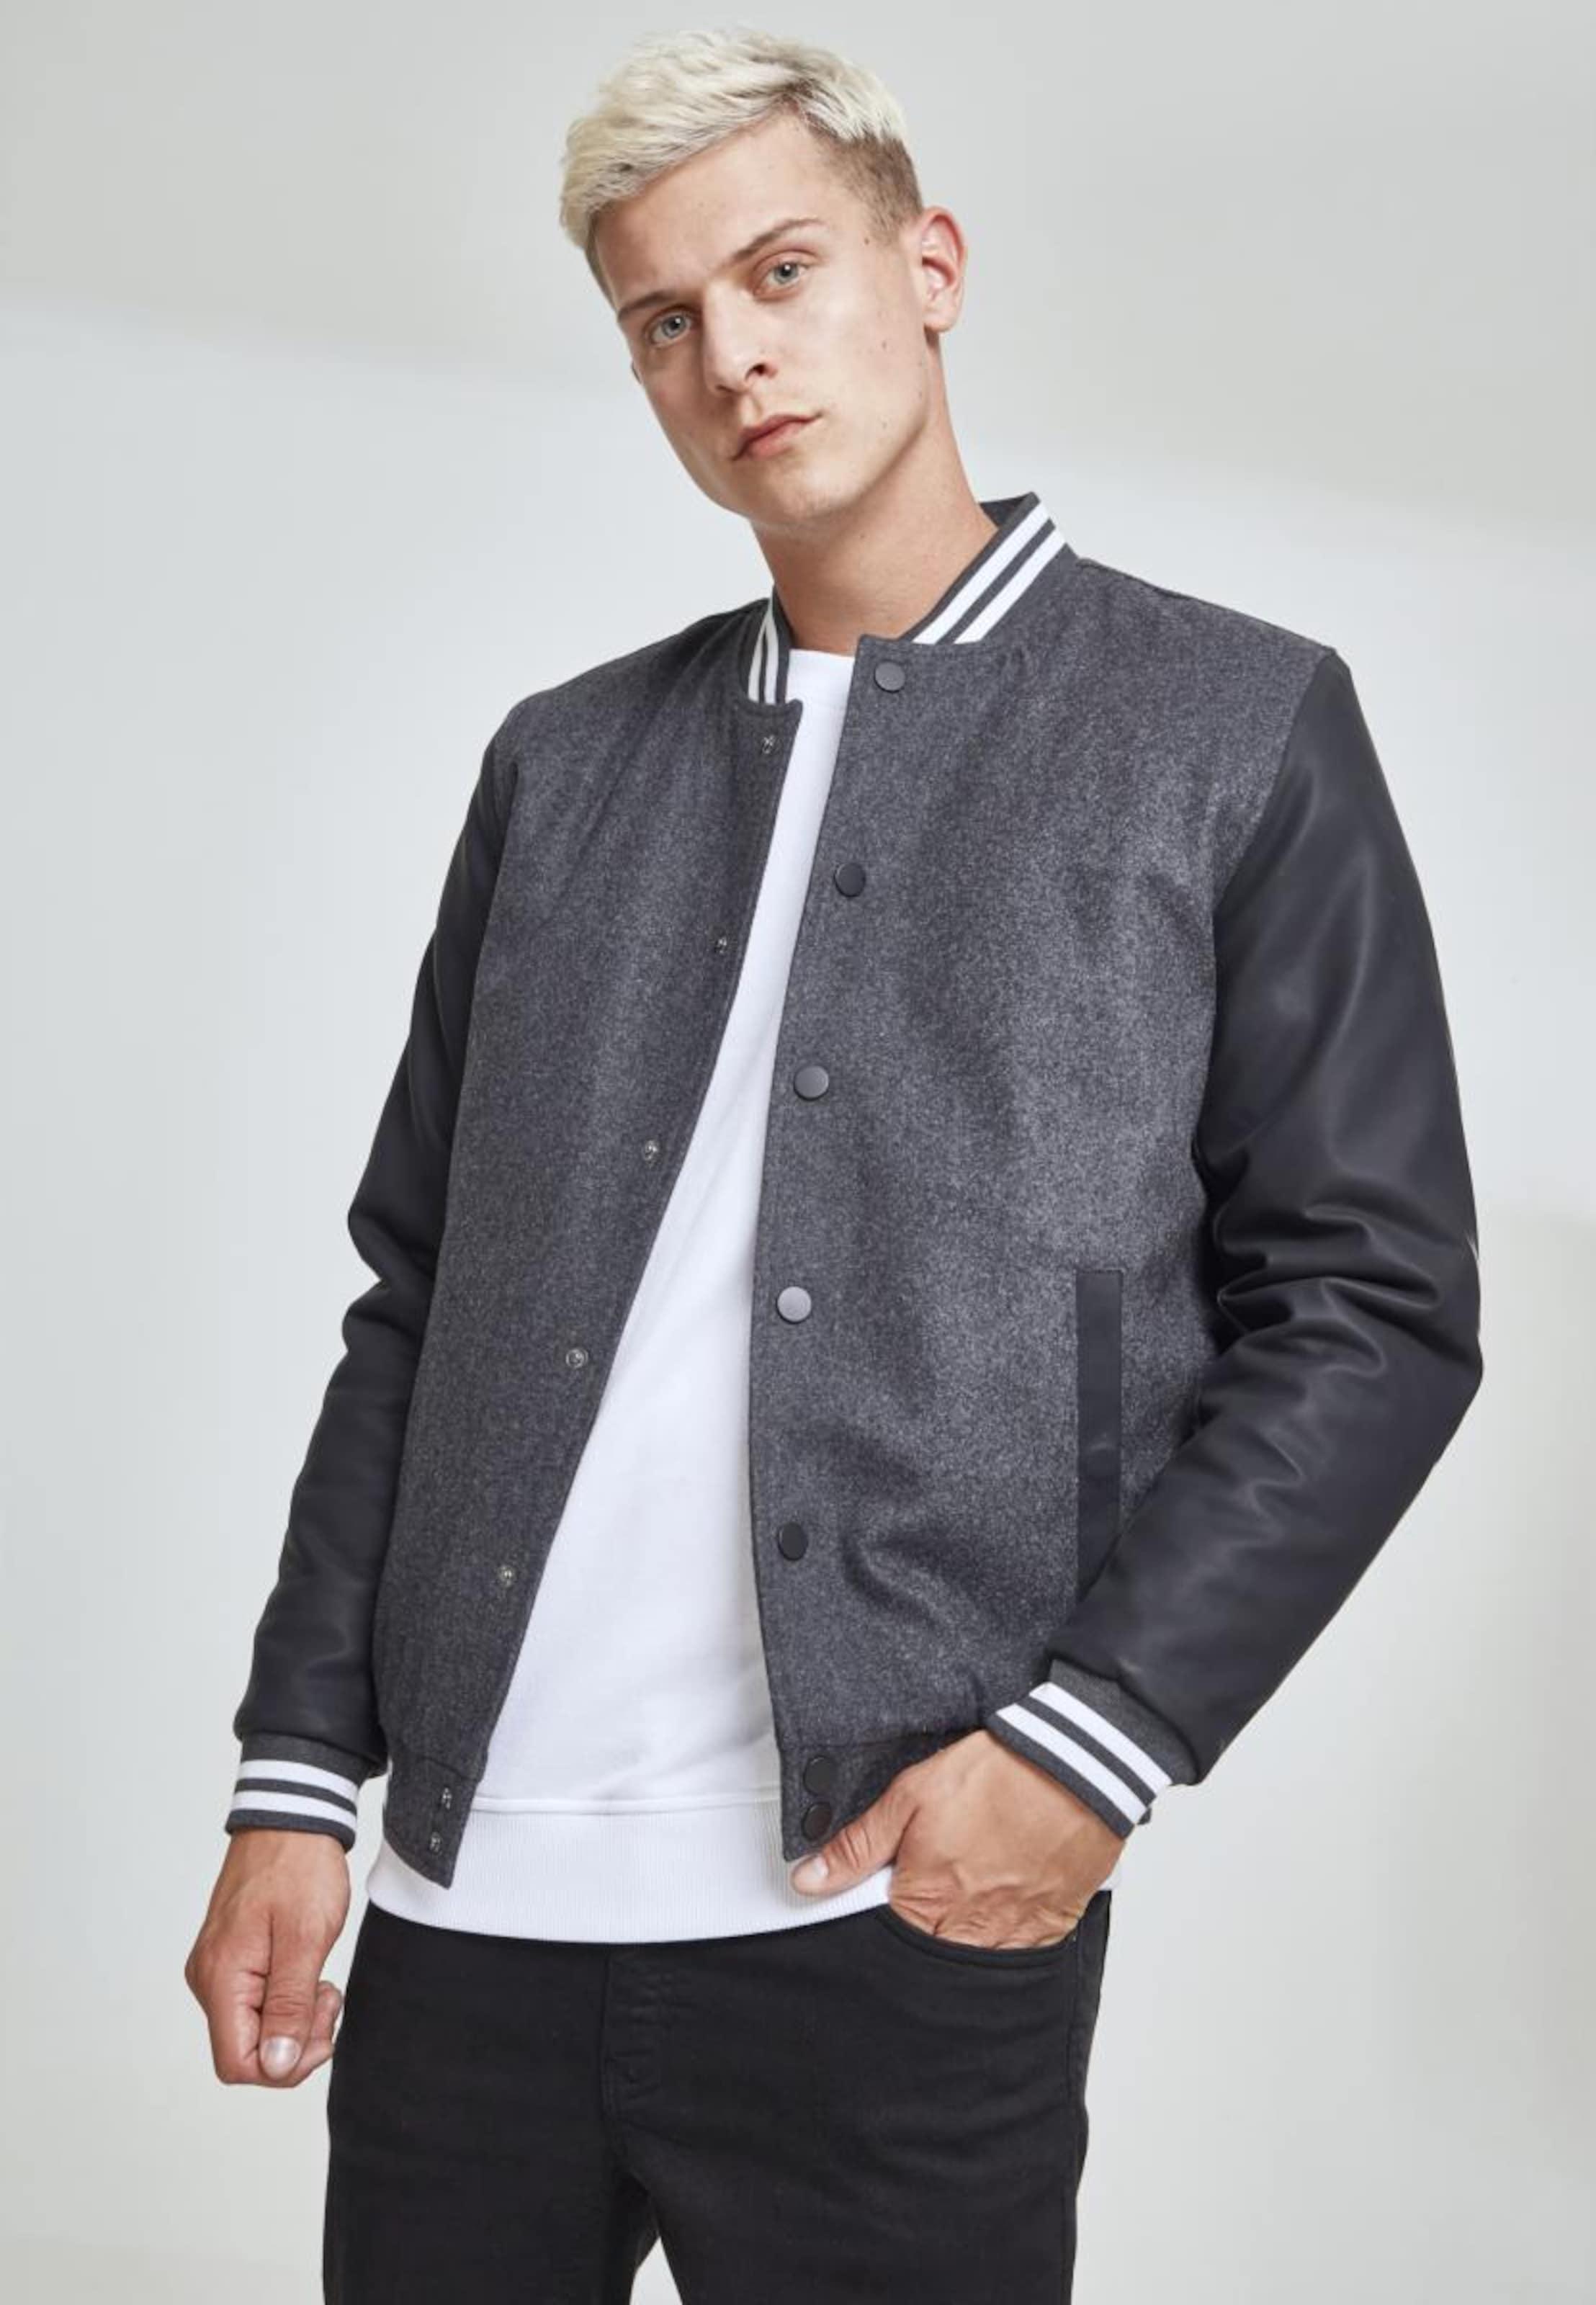 Jacket Weiß Urban 0' In 2 Classics 'oldschool SchwarzSchwarzmeliert N8n0wm